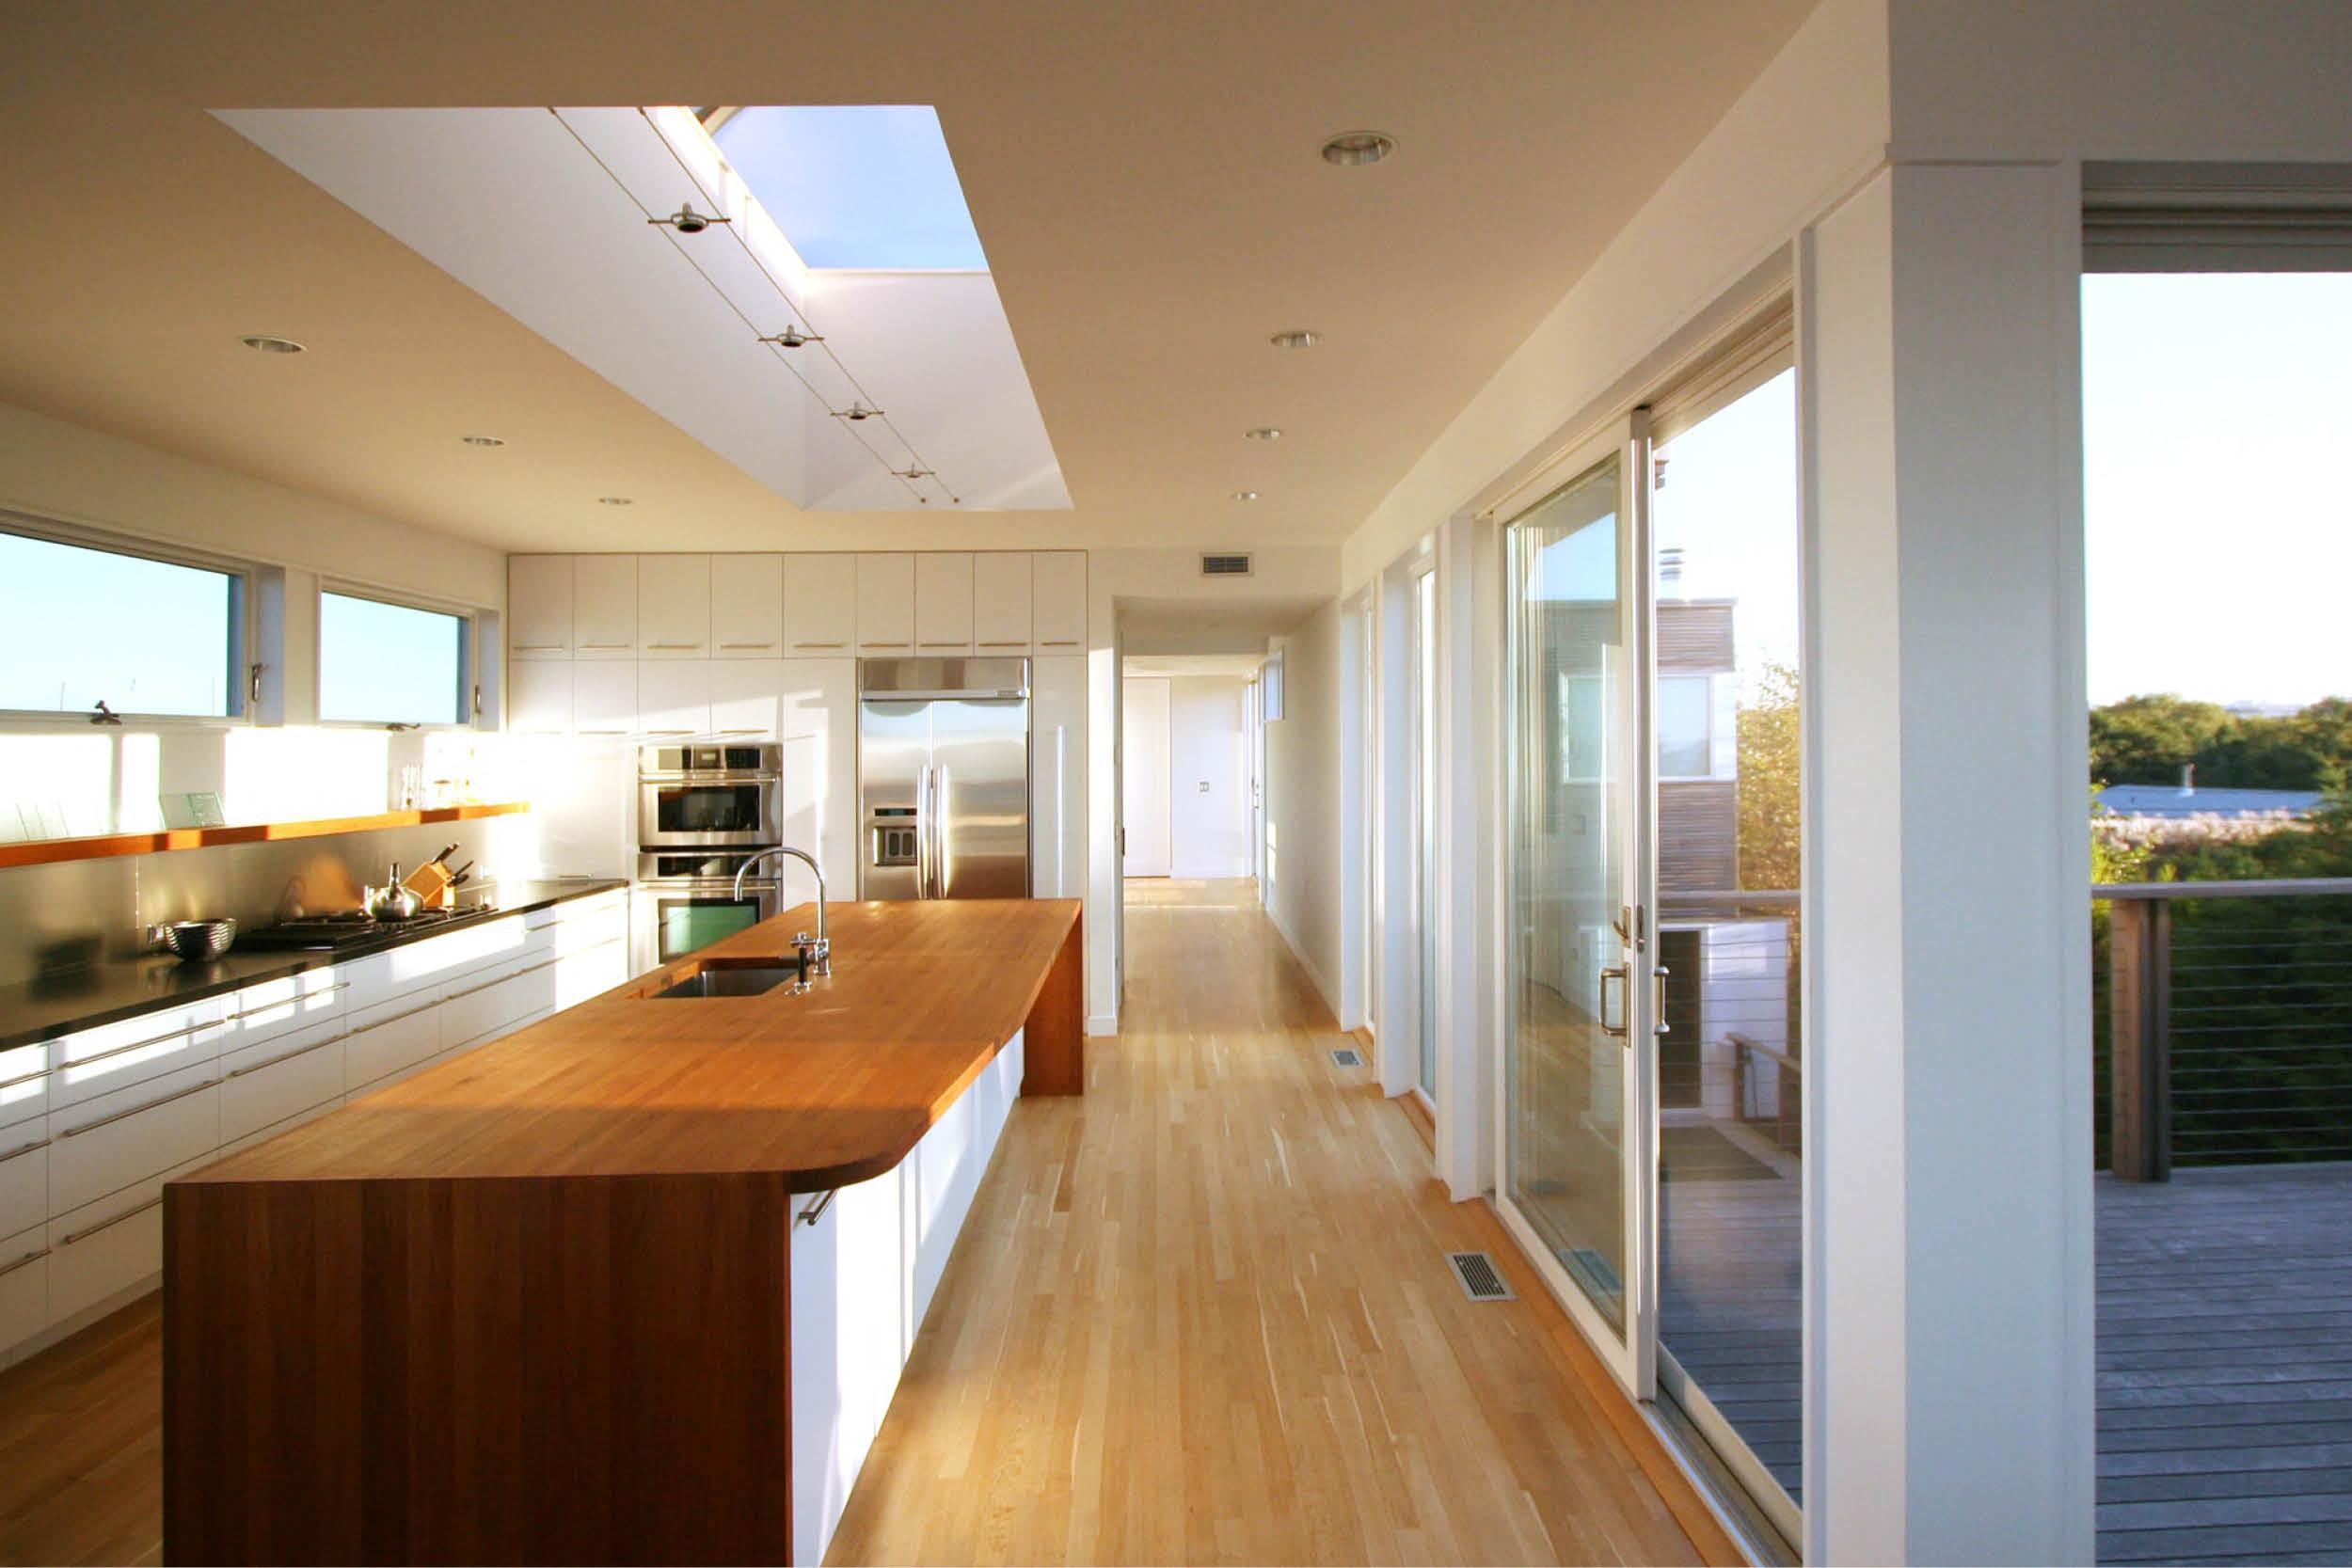 Modern Modular Prefab House | Kitchen Island Custom Cabinets Skylight | Fire Island New York | RES4